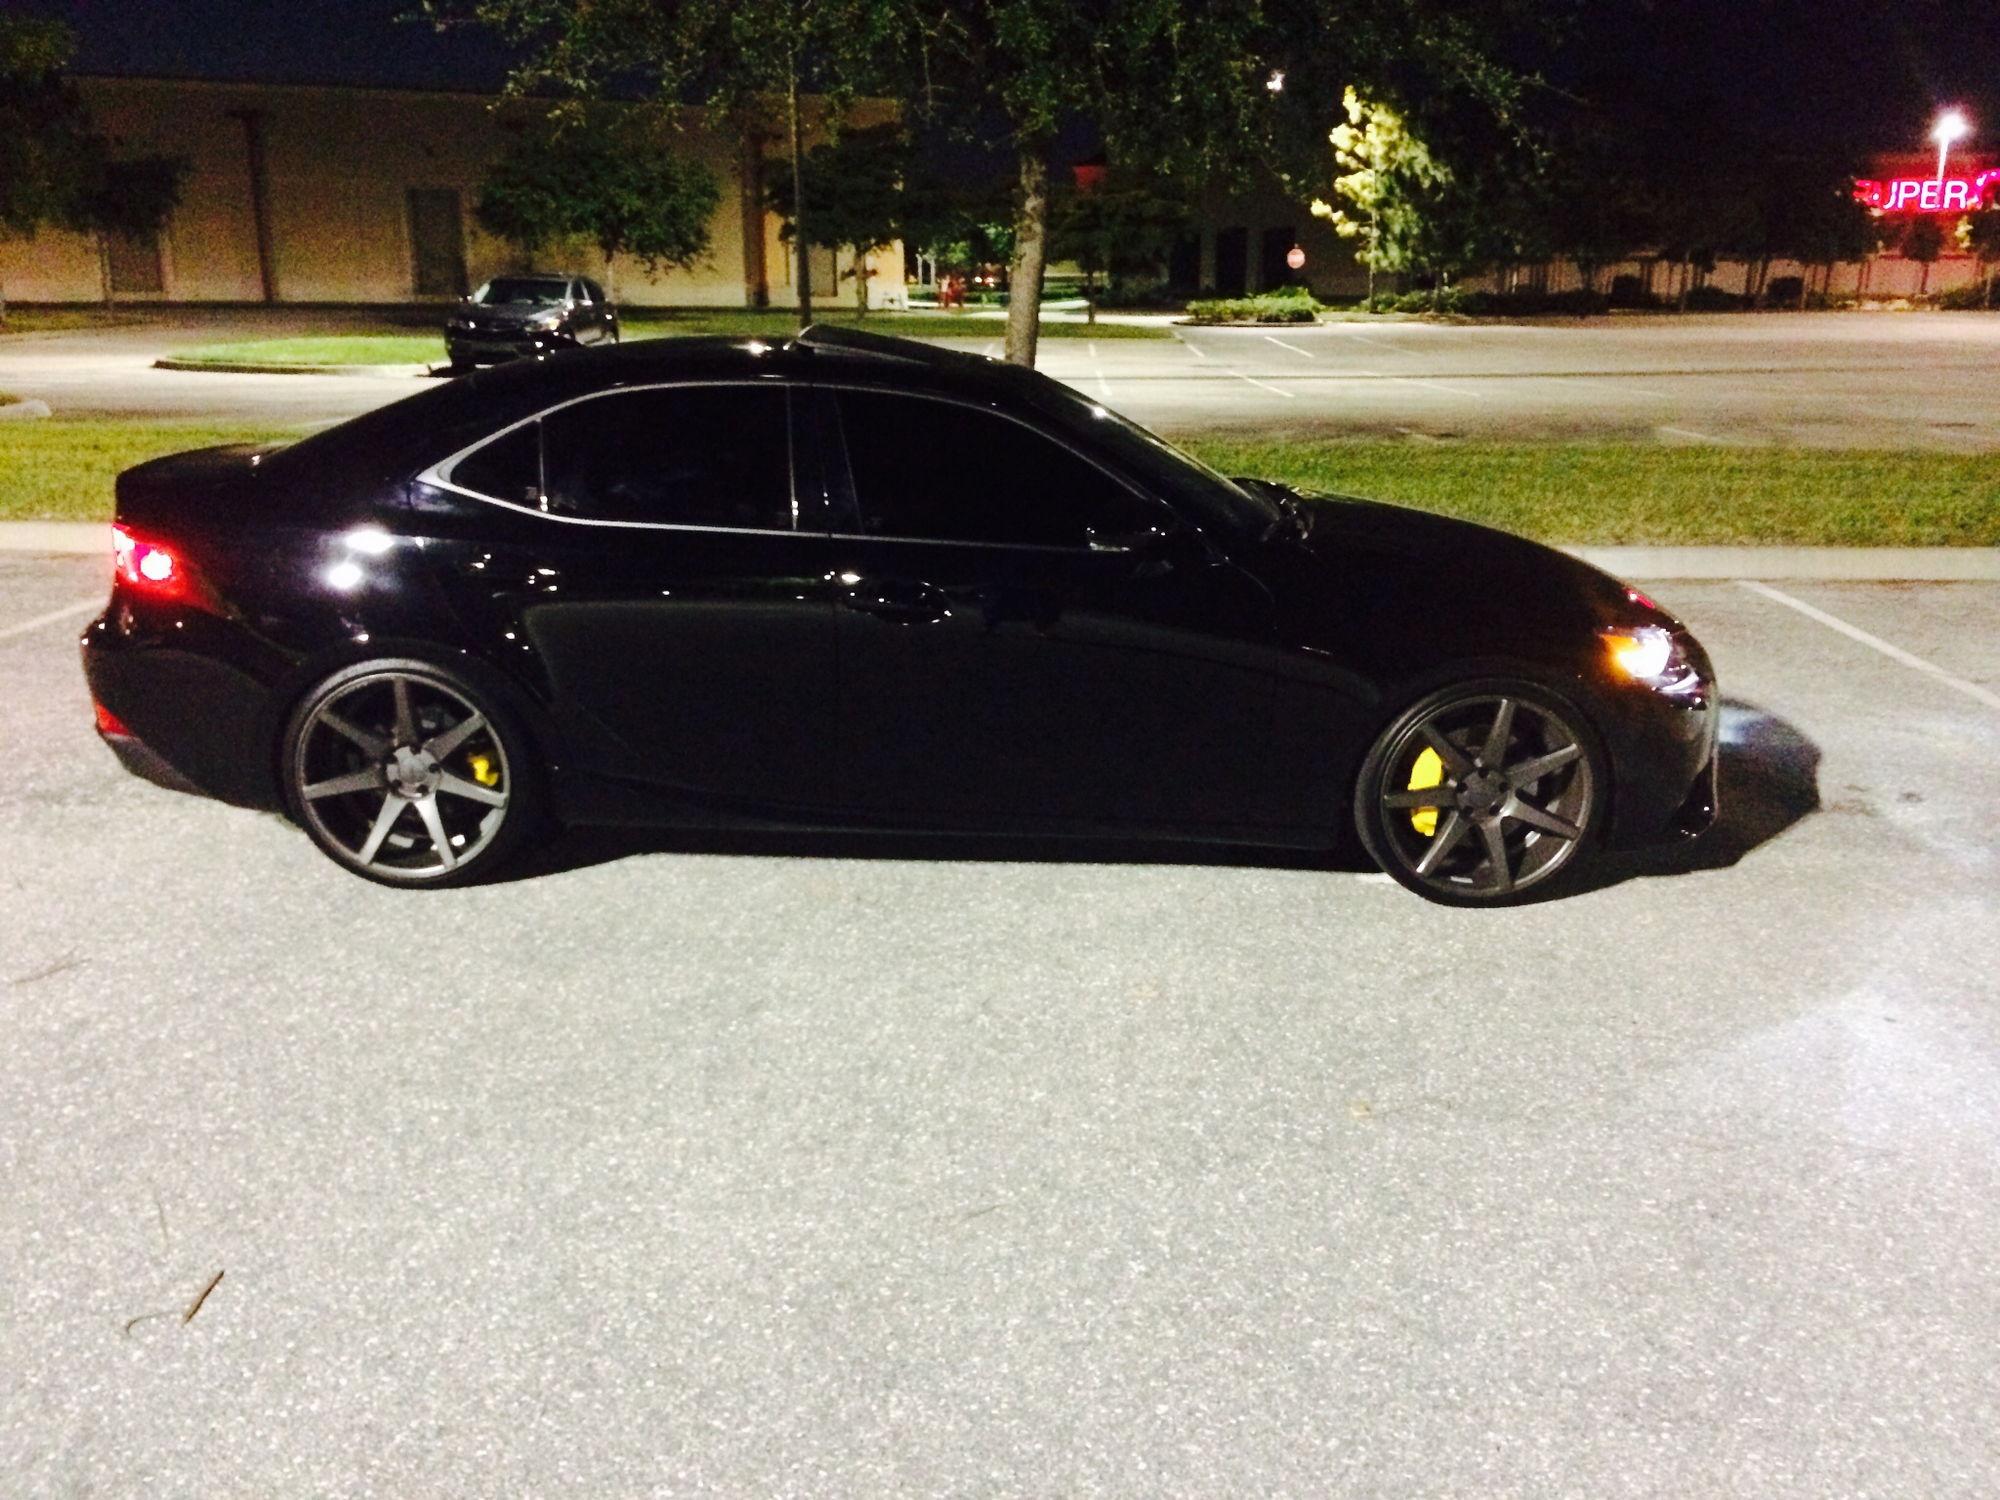 FL 2014 Lexus is350 non f sport Lease take over $350 ClubLexus